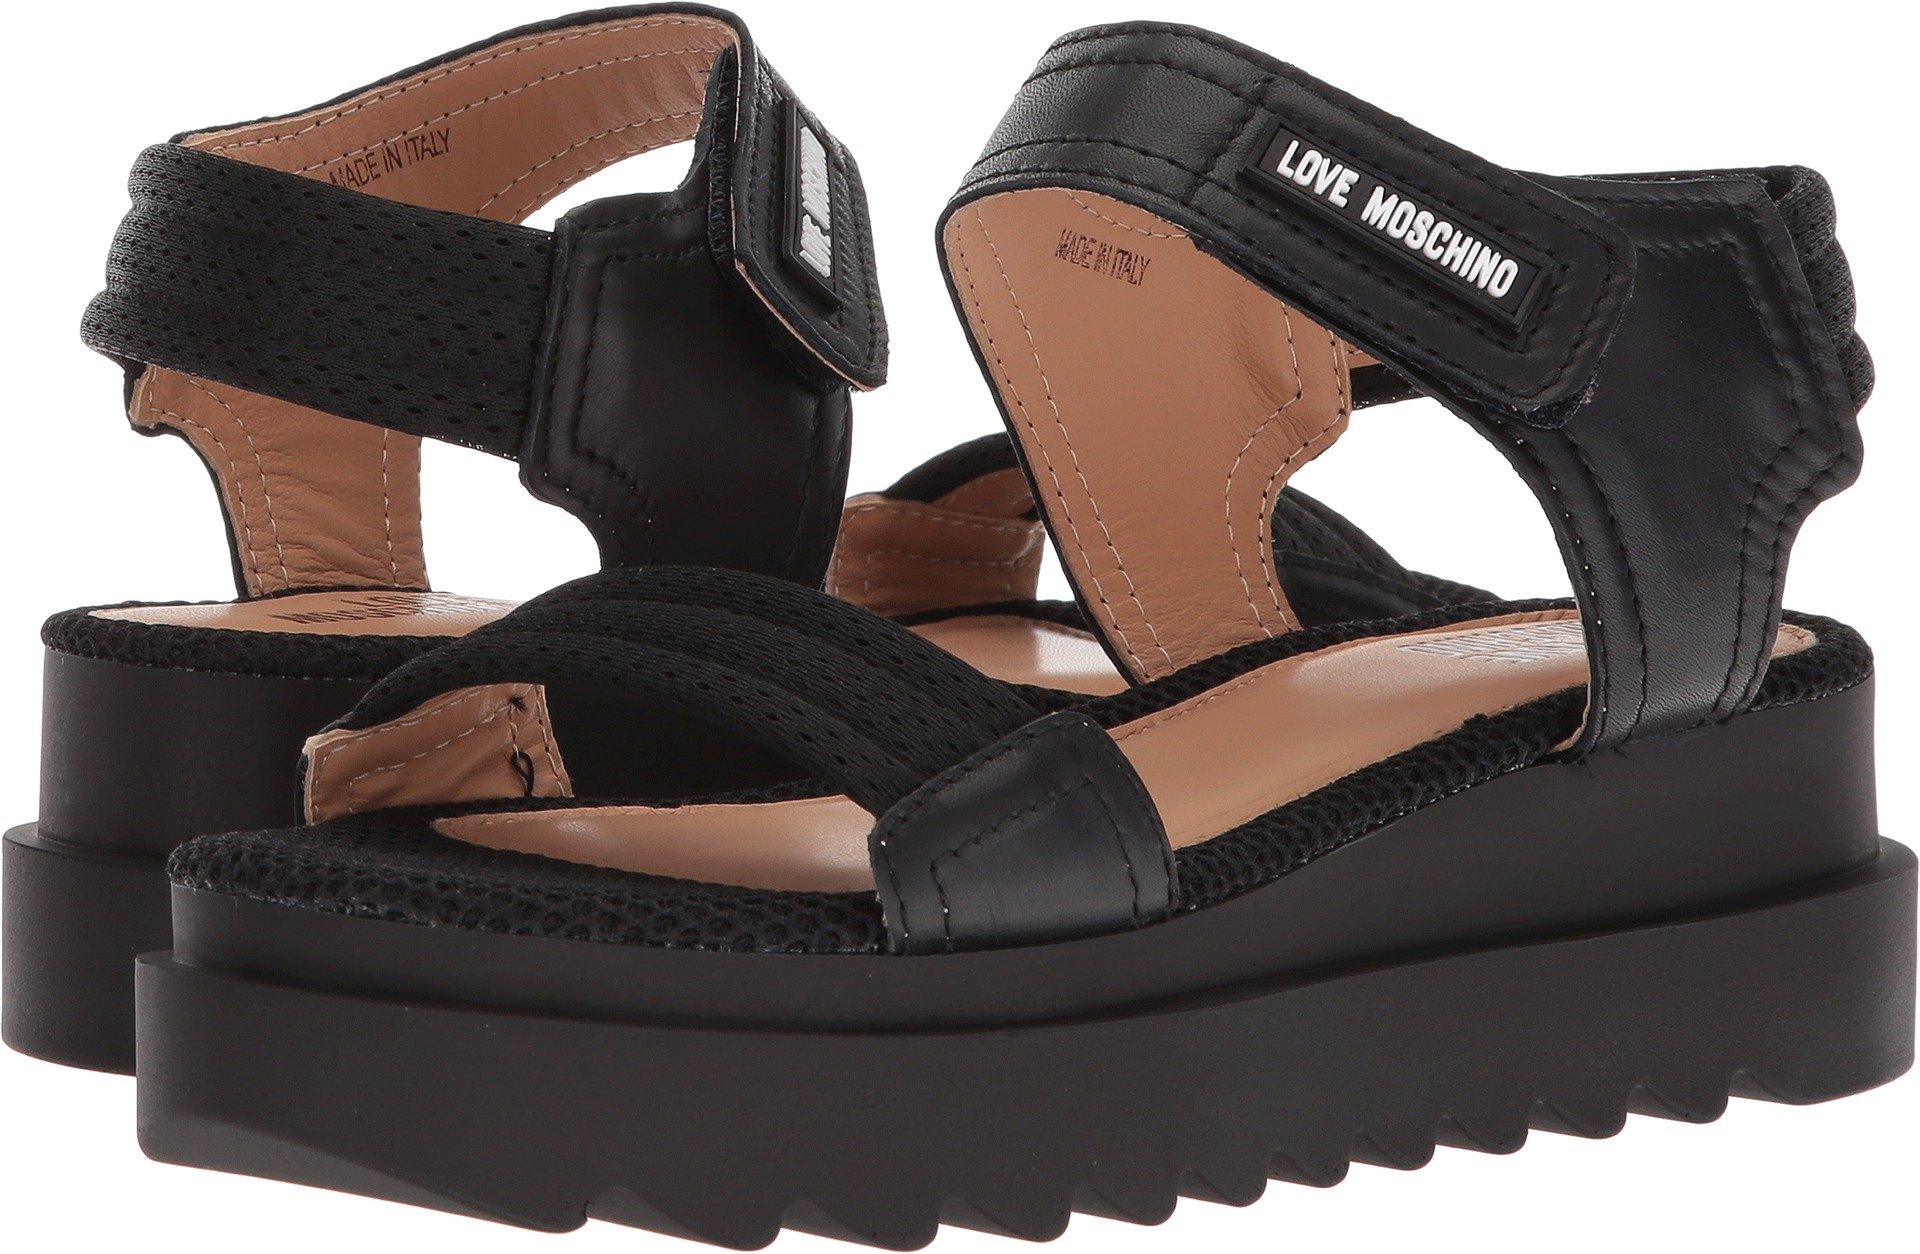 Love Moschino Women's Mesh Sandal Black 38 M EU